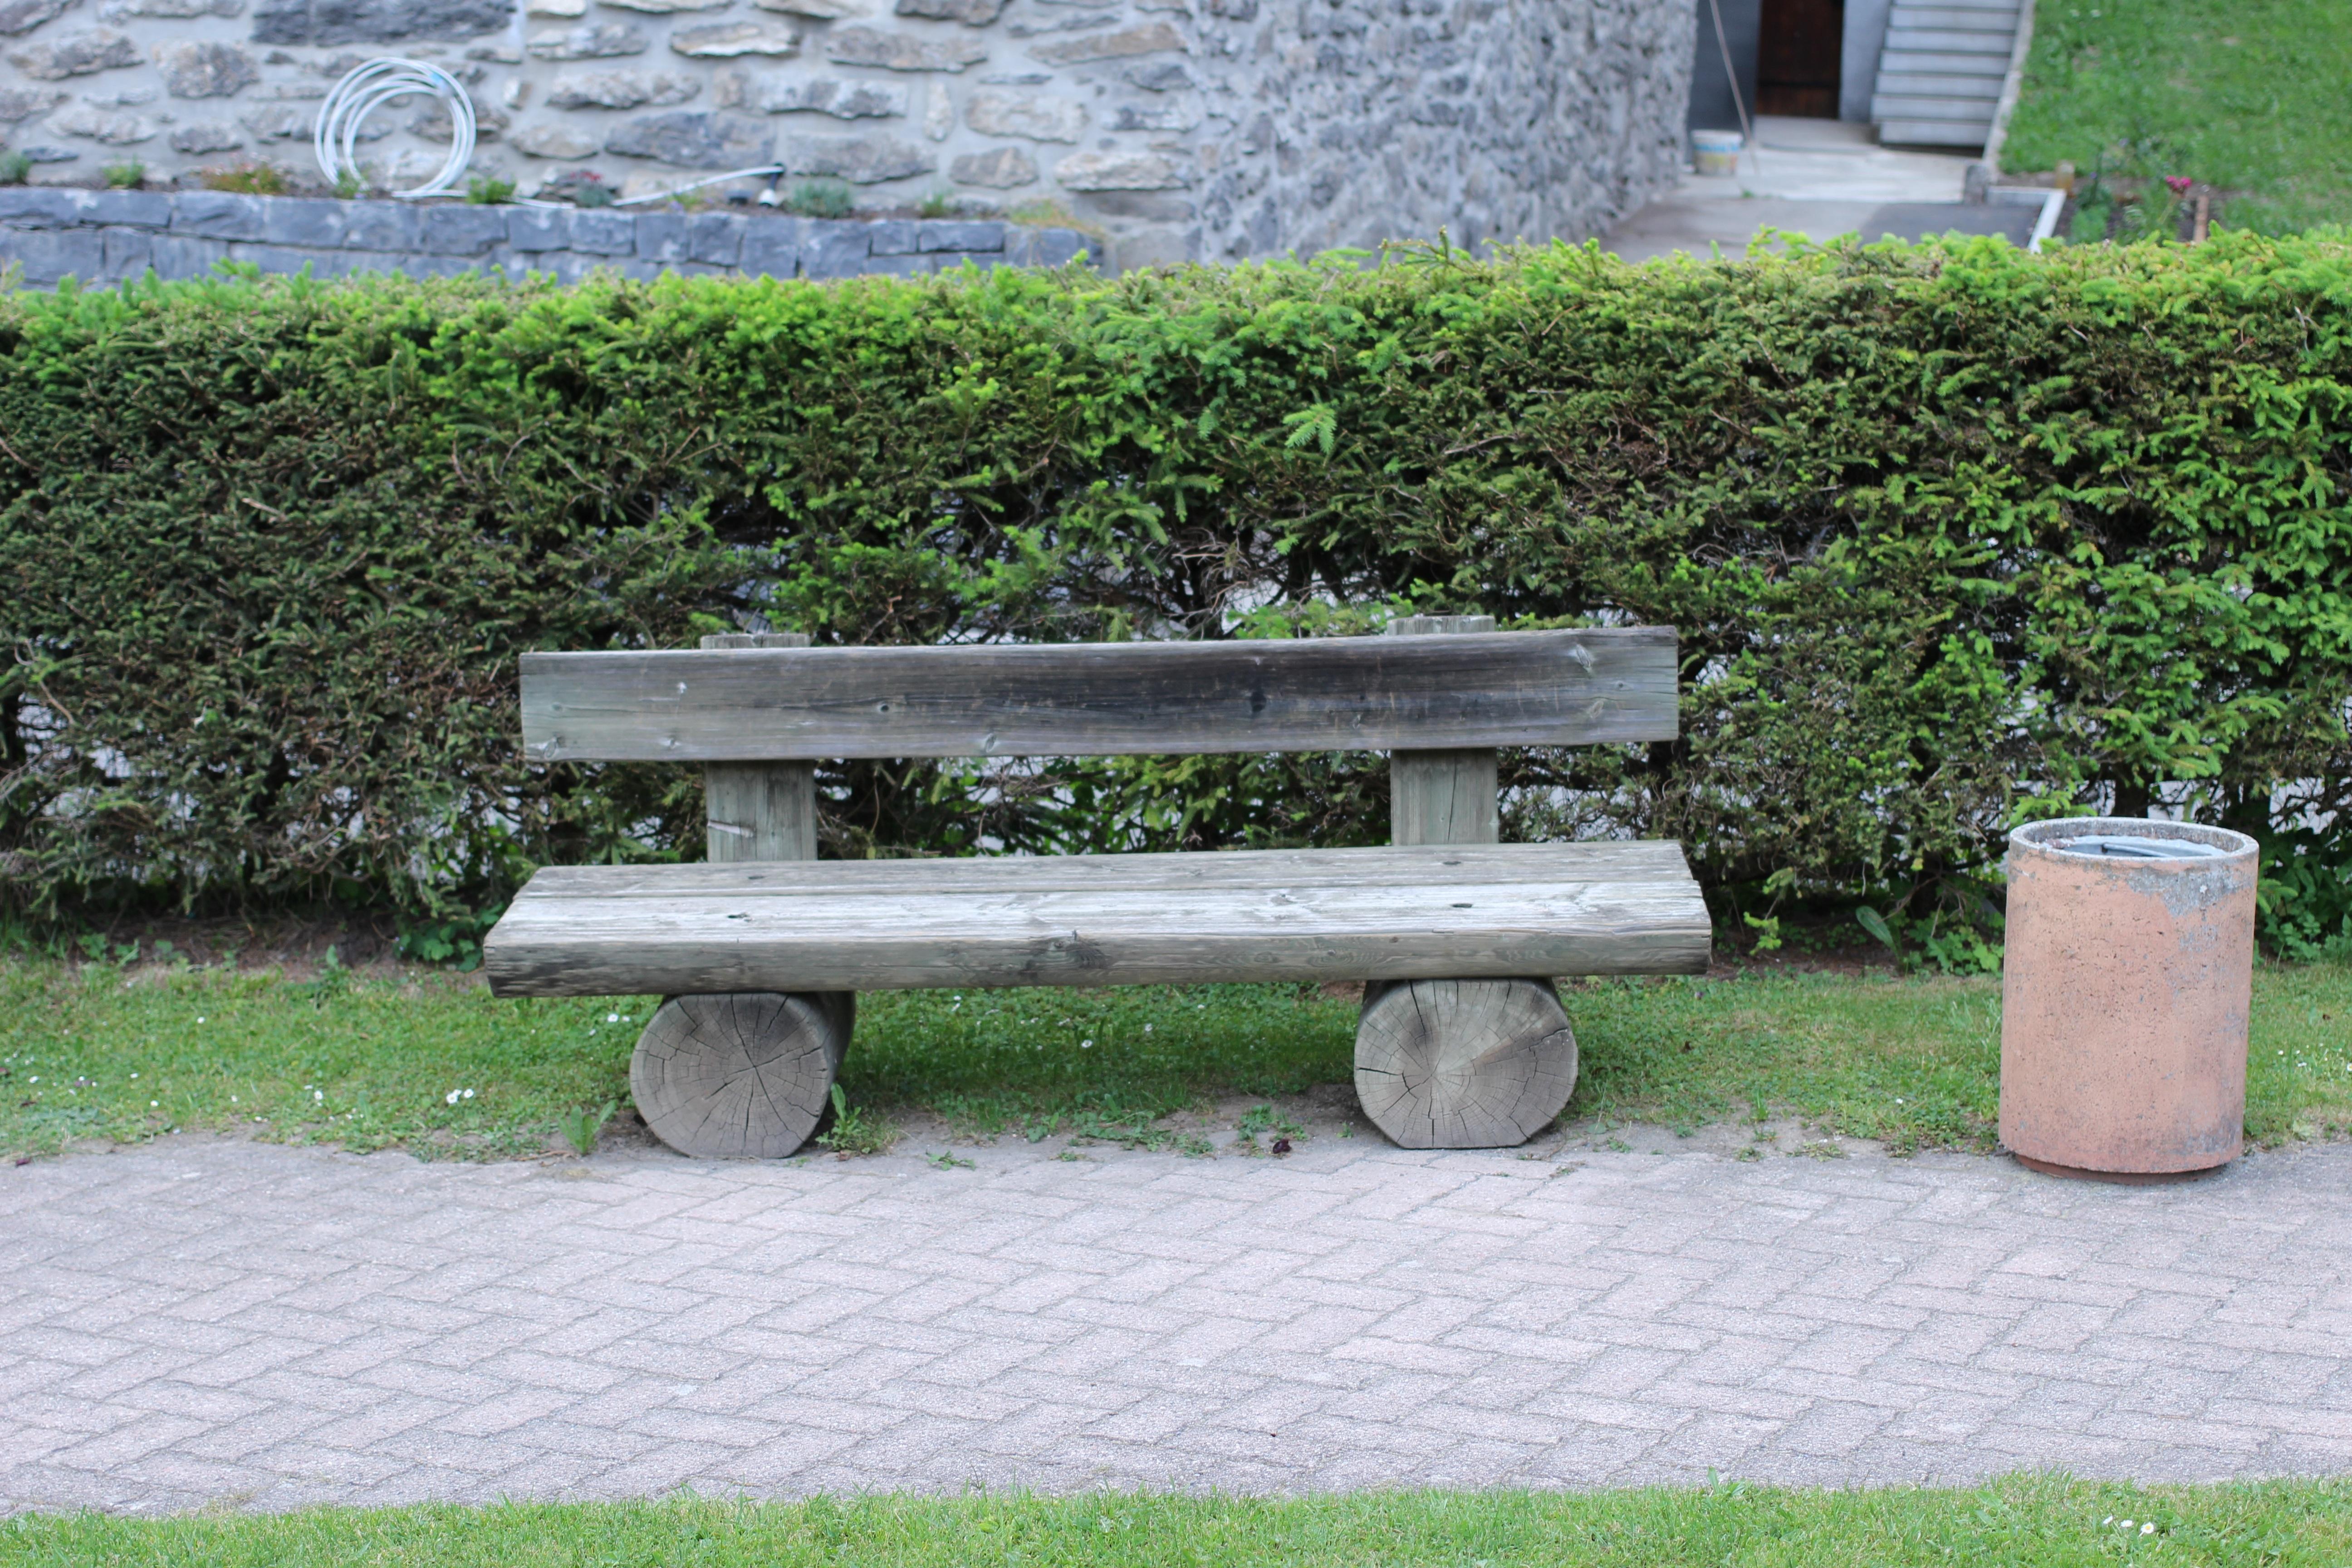 Fotos gratis : naturaleza, césped, banco, parque, patio interior ...